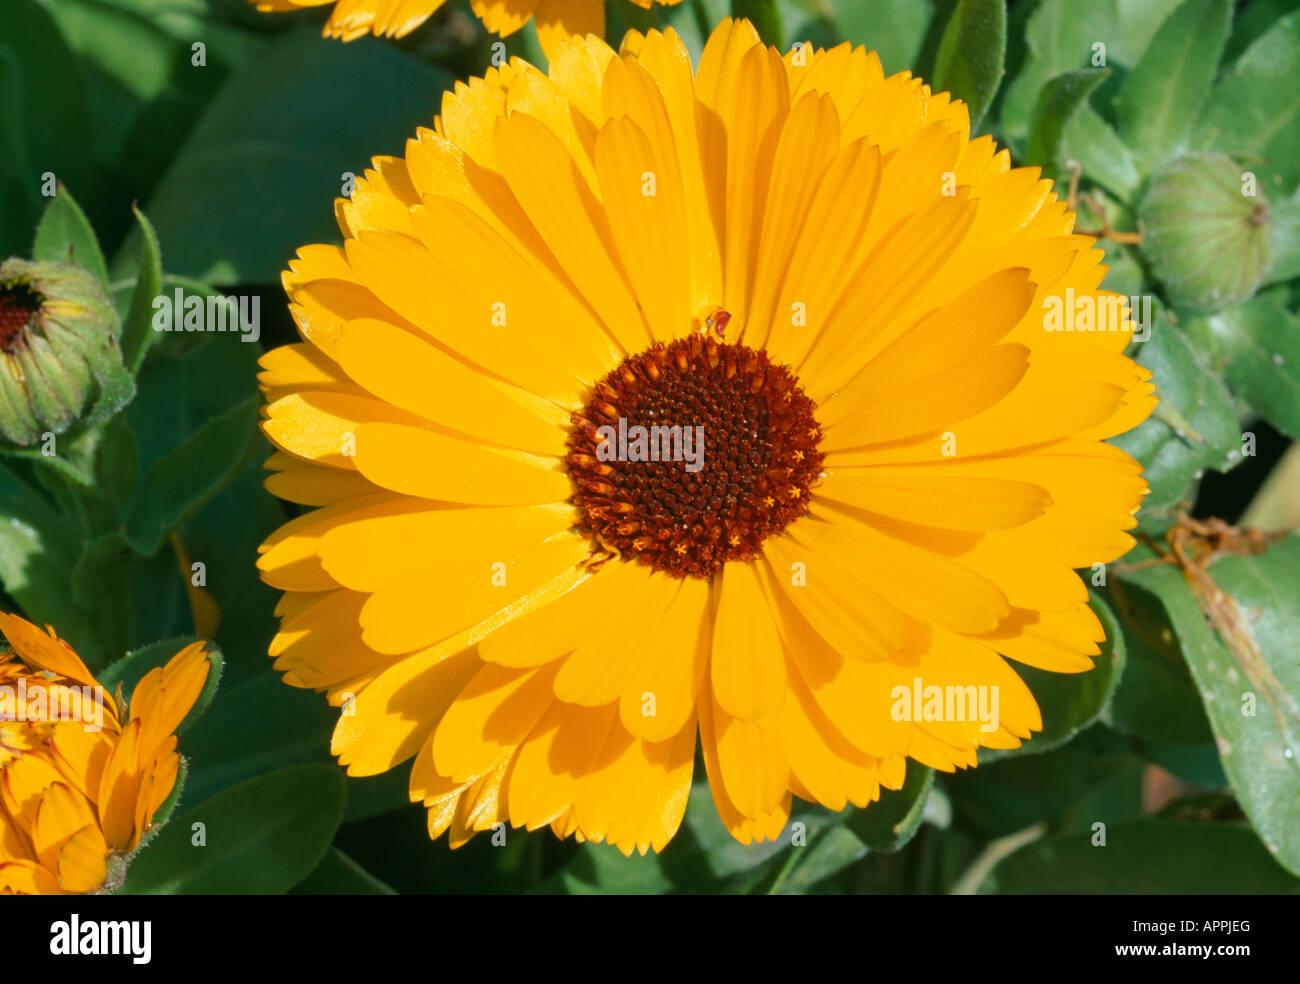 Calendula yellow flower with an outstanding ambery heart - Stock Image